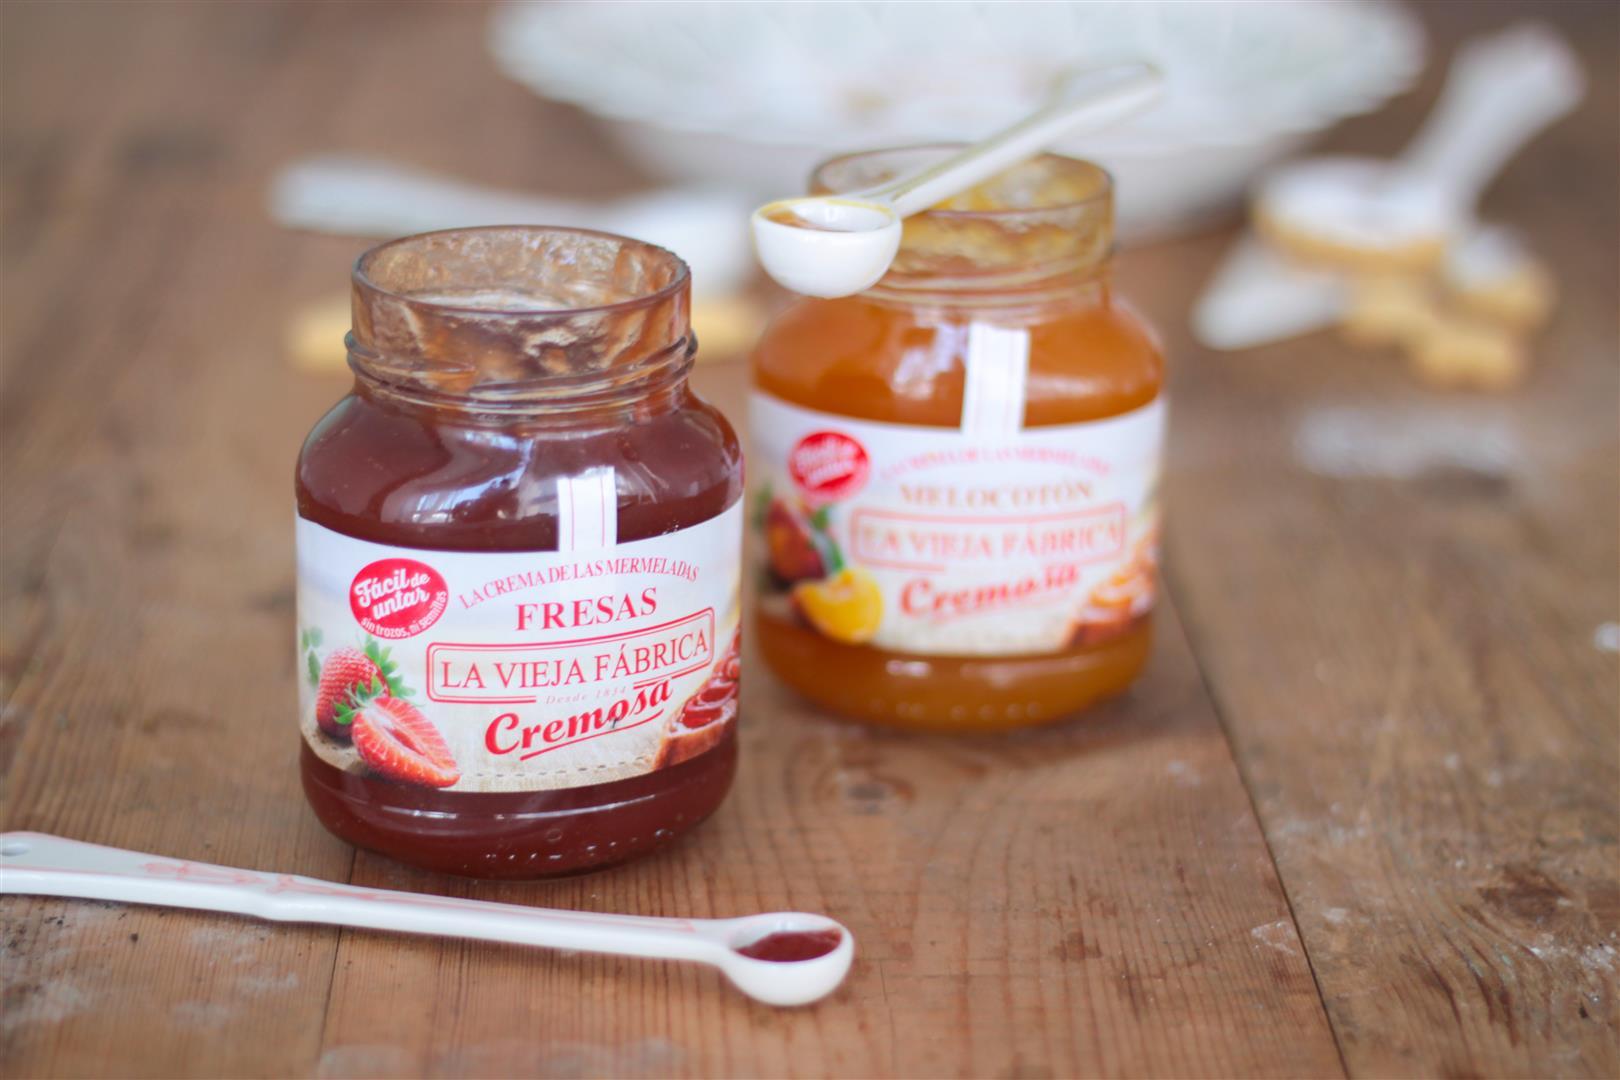 la-vieja-fabrica-mermelada-cremosa-(3)